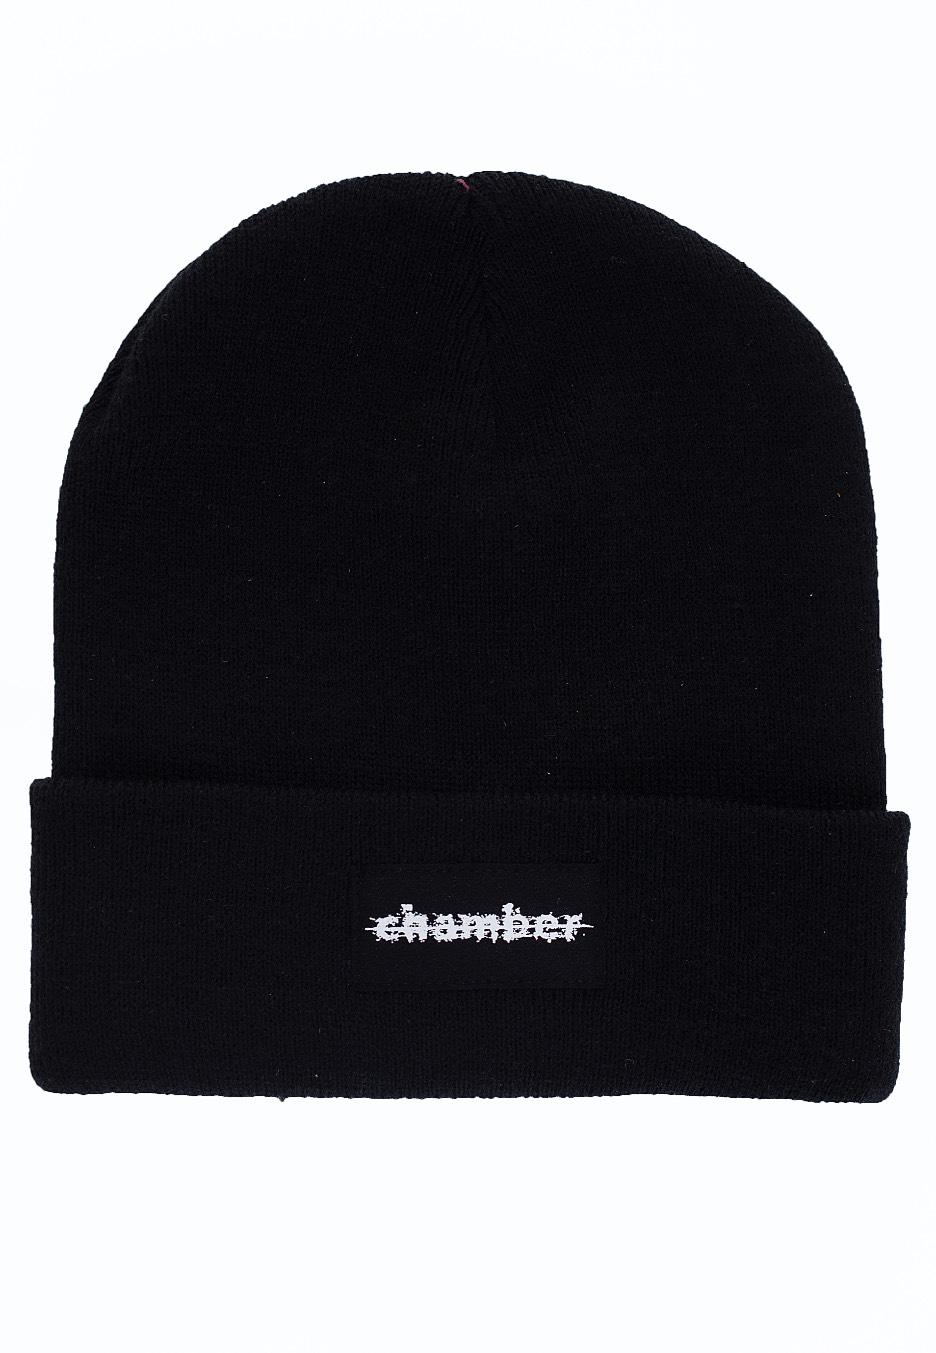 Chamber - Logo - Beanies